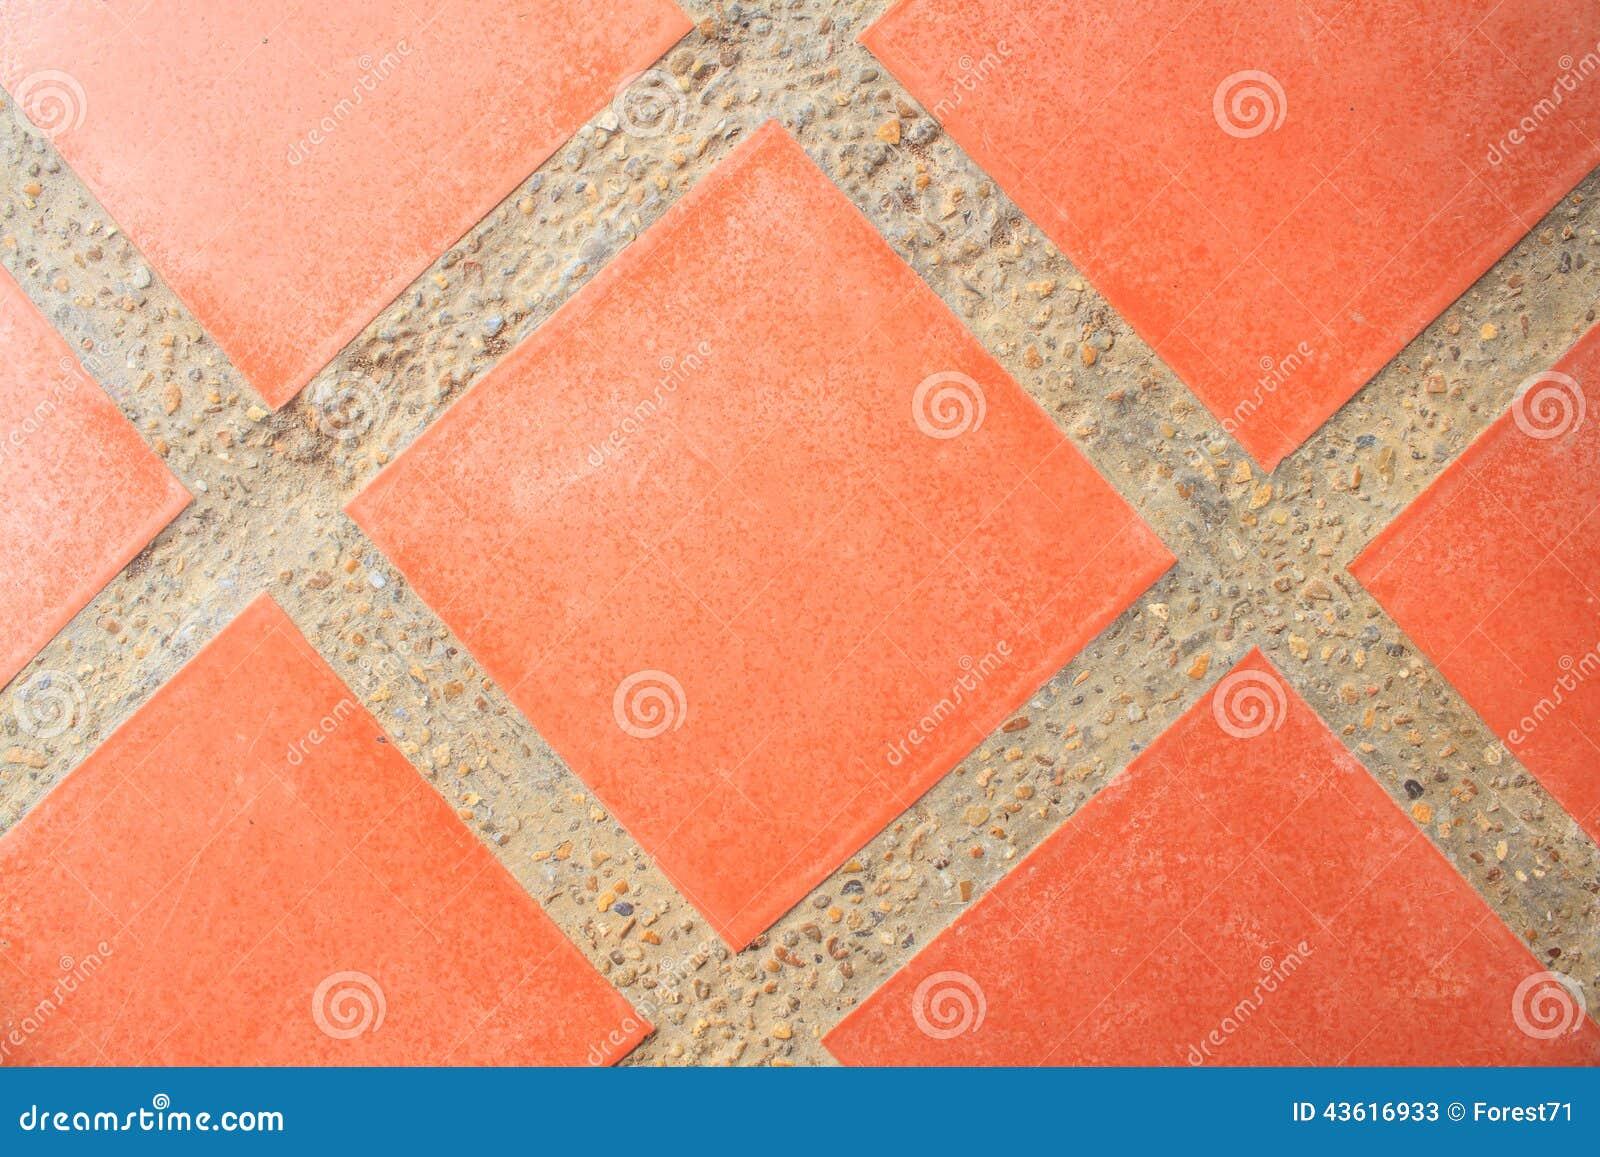 royaltyfree stock photo download ceramic floor tiles